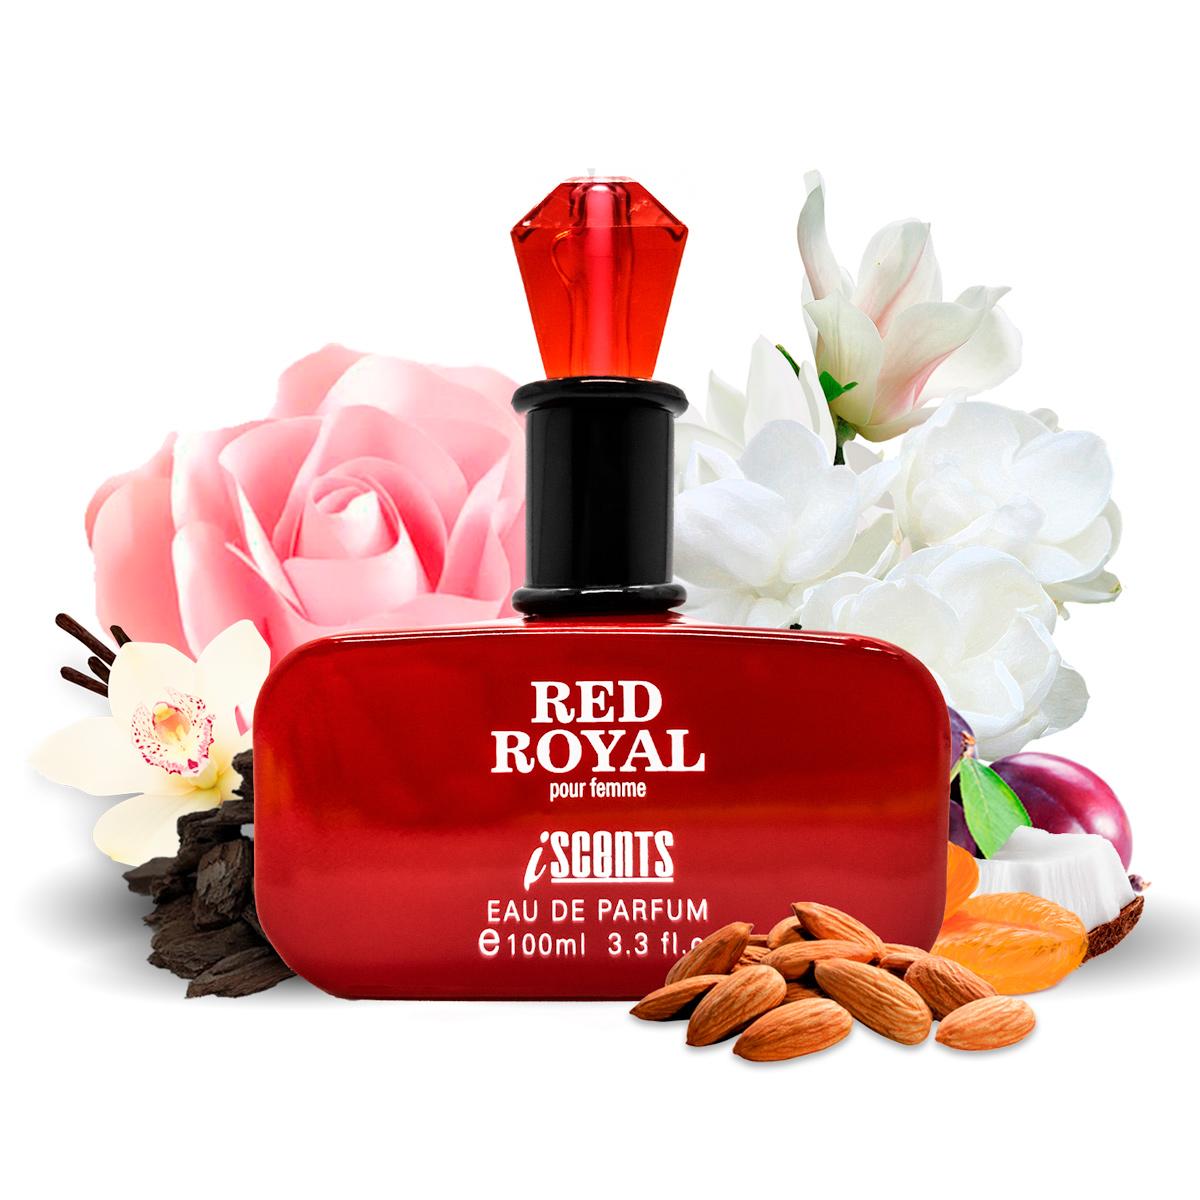 Kit 2 Perfumes Importados Red Royal e Super Rich I Scents